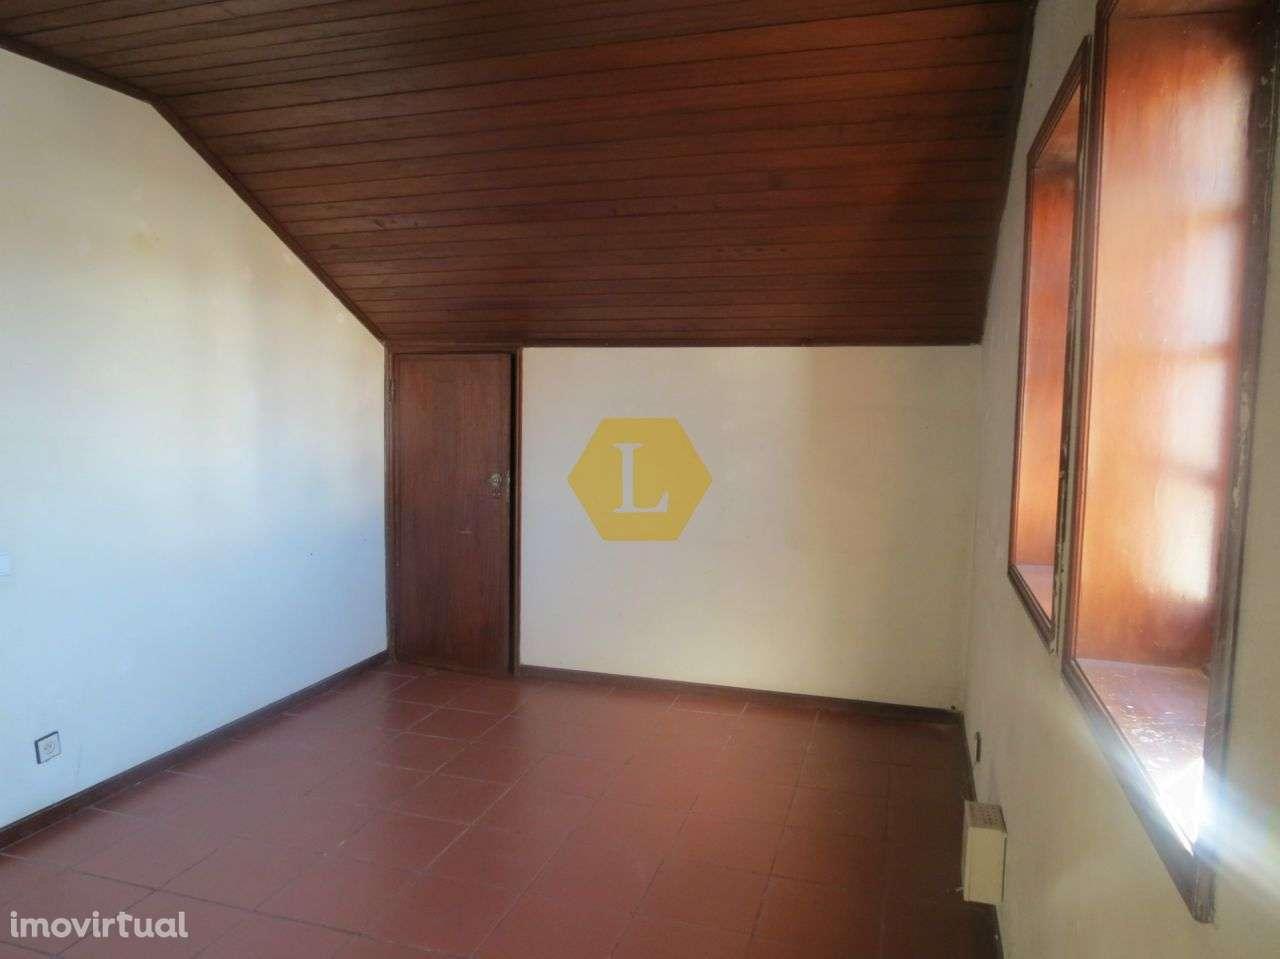 Moradia para comprar, Santa Joana, Aveiro - Foto 9